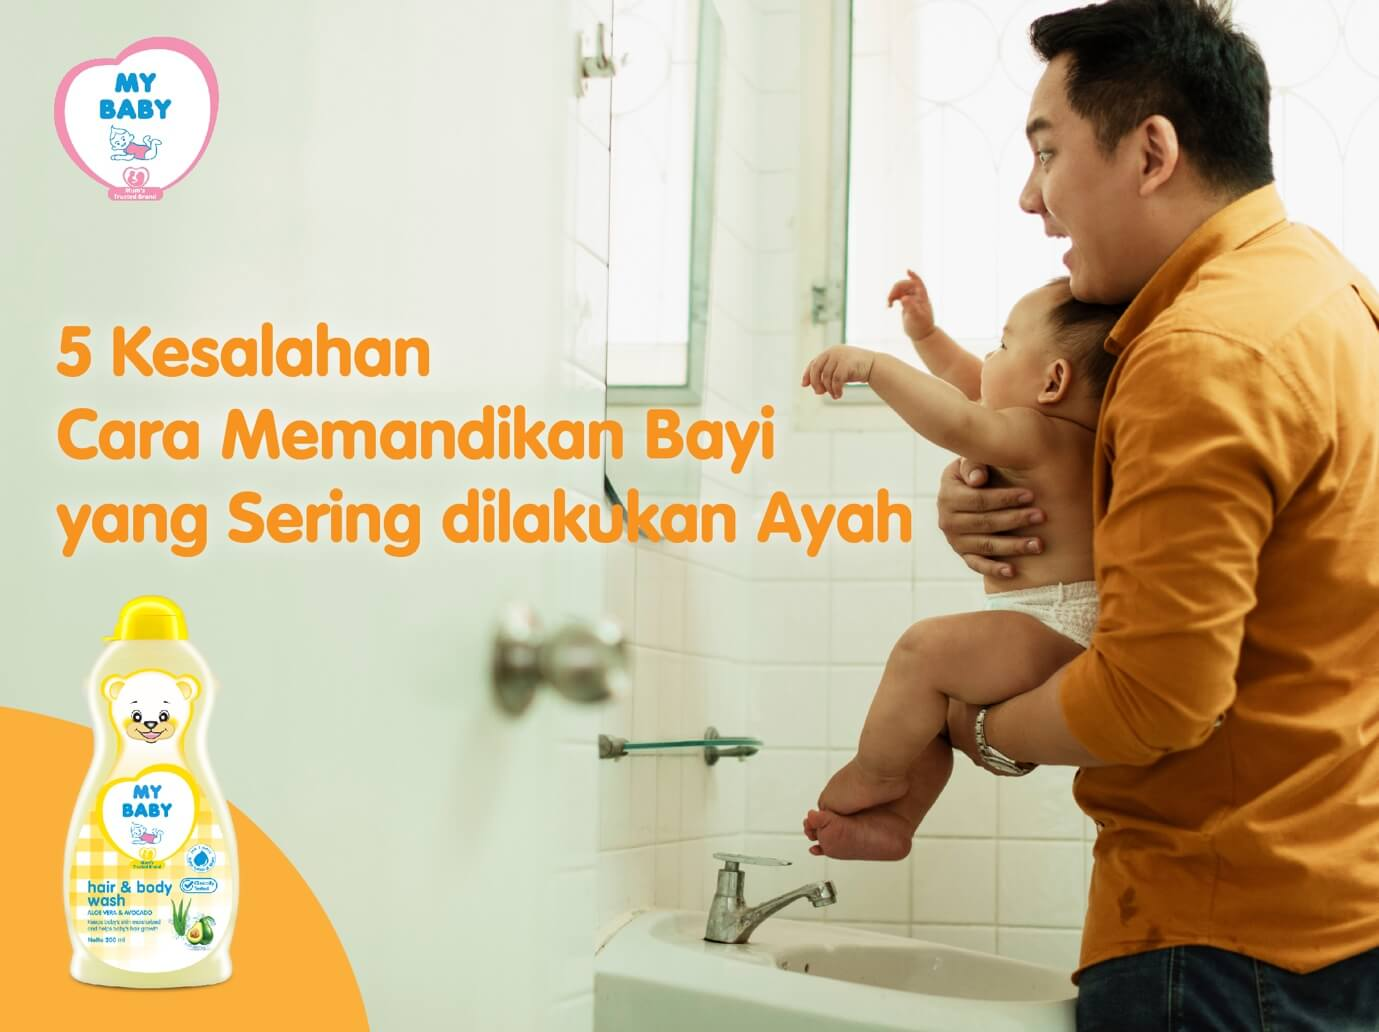 5 Kesalahan Cara Memandikan Bayi Yang Sering dilakukan Ayah